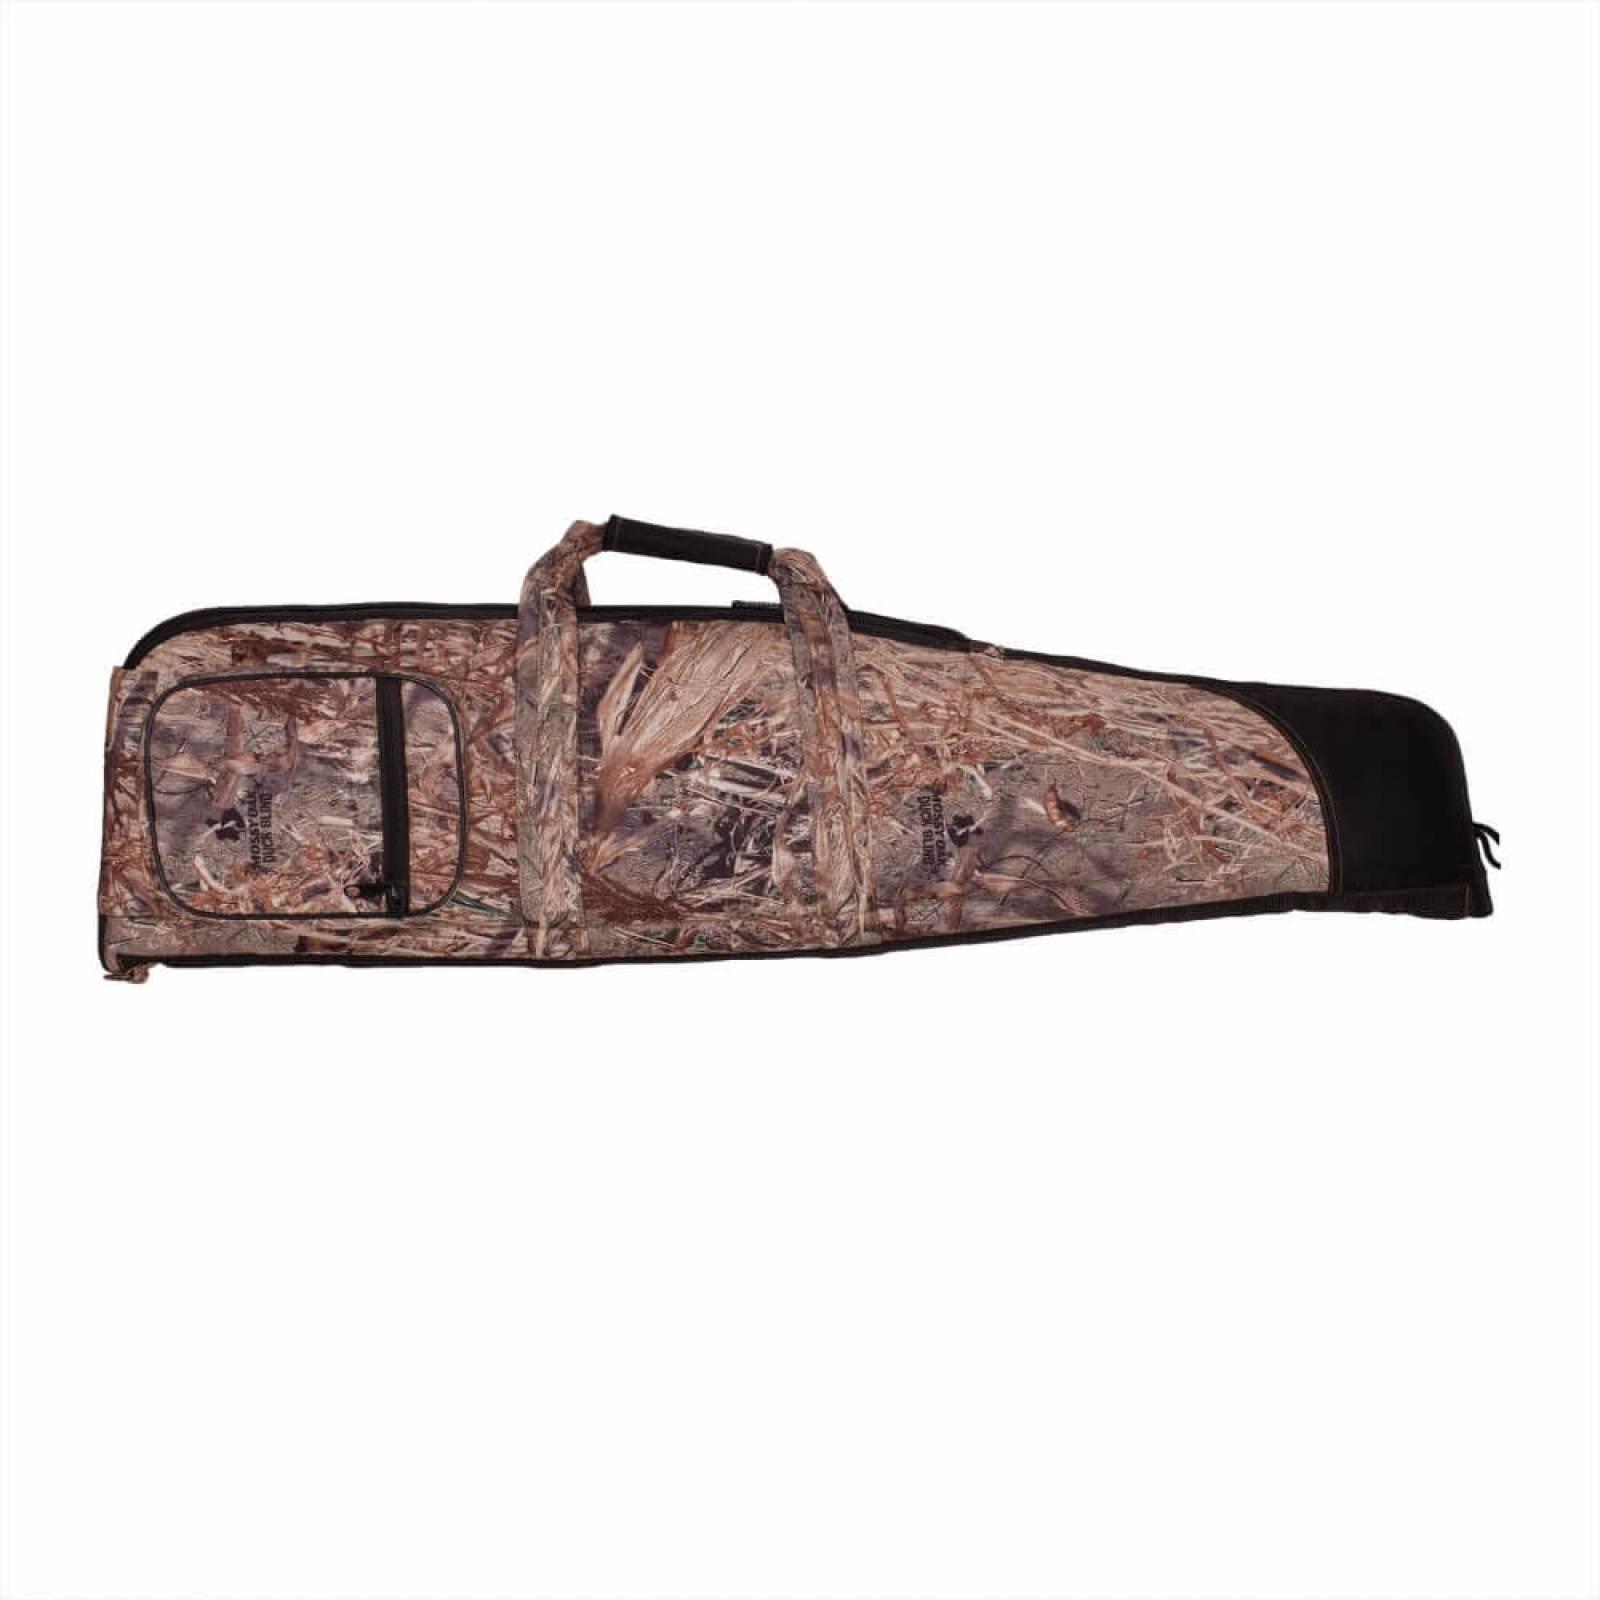 S.U.H Rifle Case TARGET in MOSSYOAK DUCKBLIND Fabric Front